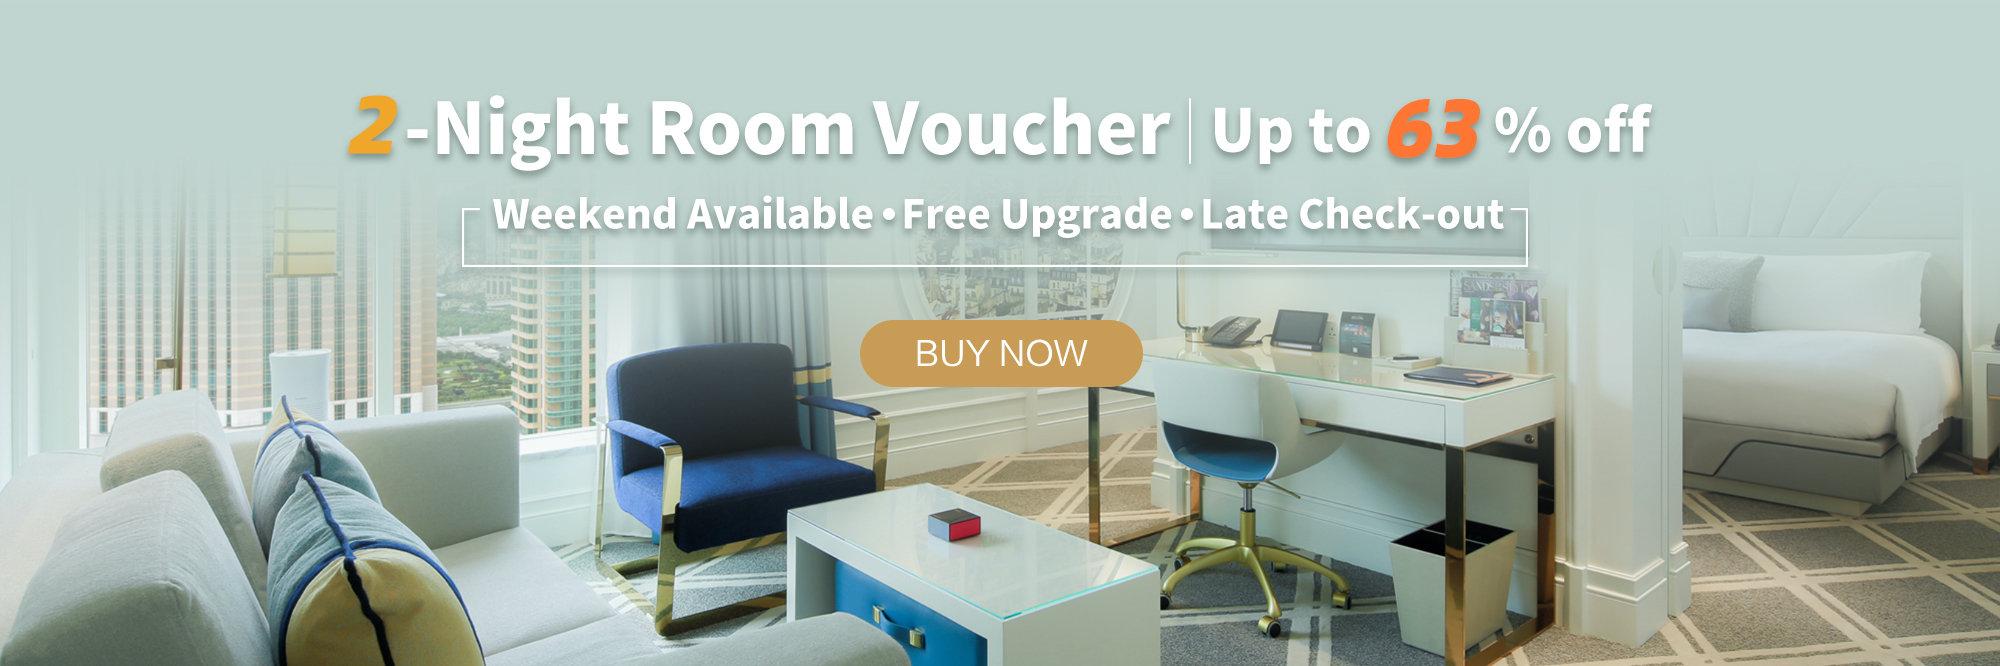 https://assets.sandsresortsmacao.cn/content/sandsresortsmacao/macau-offers/staycation-macao-package/staycation-macao-package_cta-banner_2000x666_en.jpg--------------------https://www.parisianmacao.com/macau-hotel/promotions-offers/staycation-macao-package.html